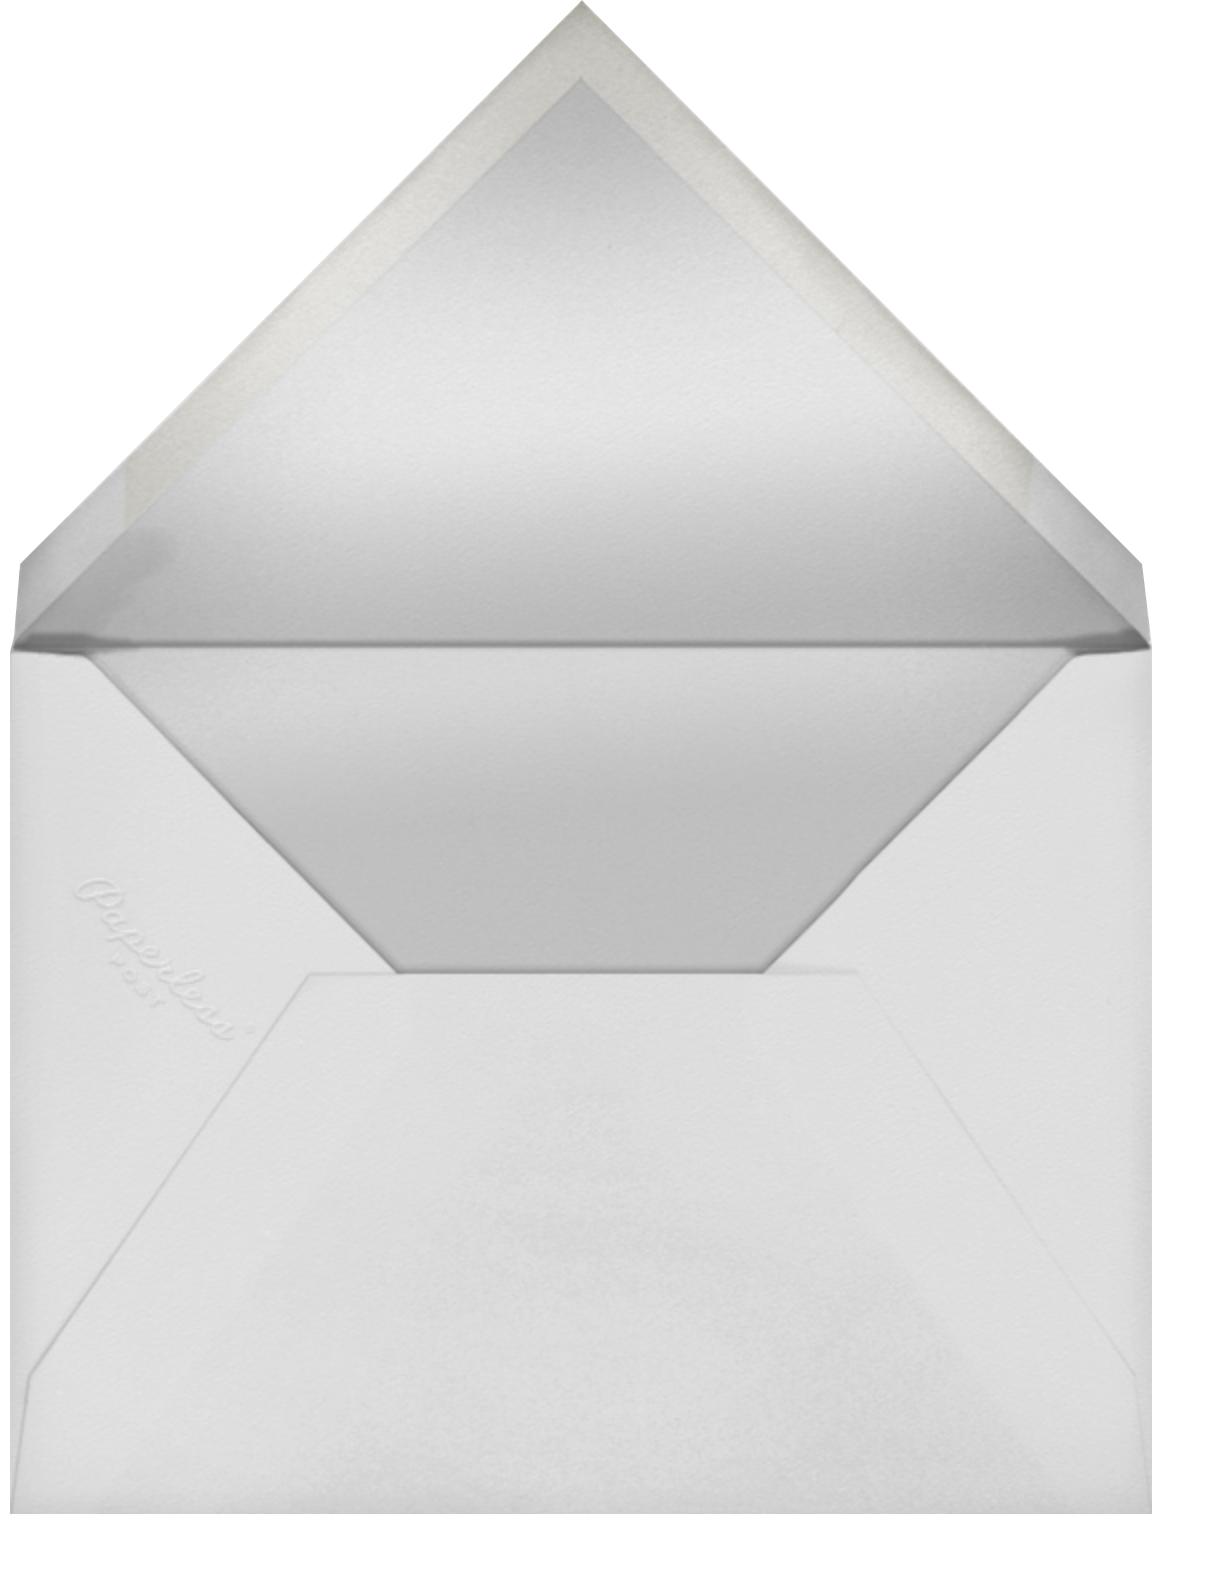 Betsy (Program) - Red - Liberty - Envelope